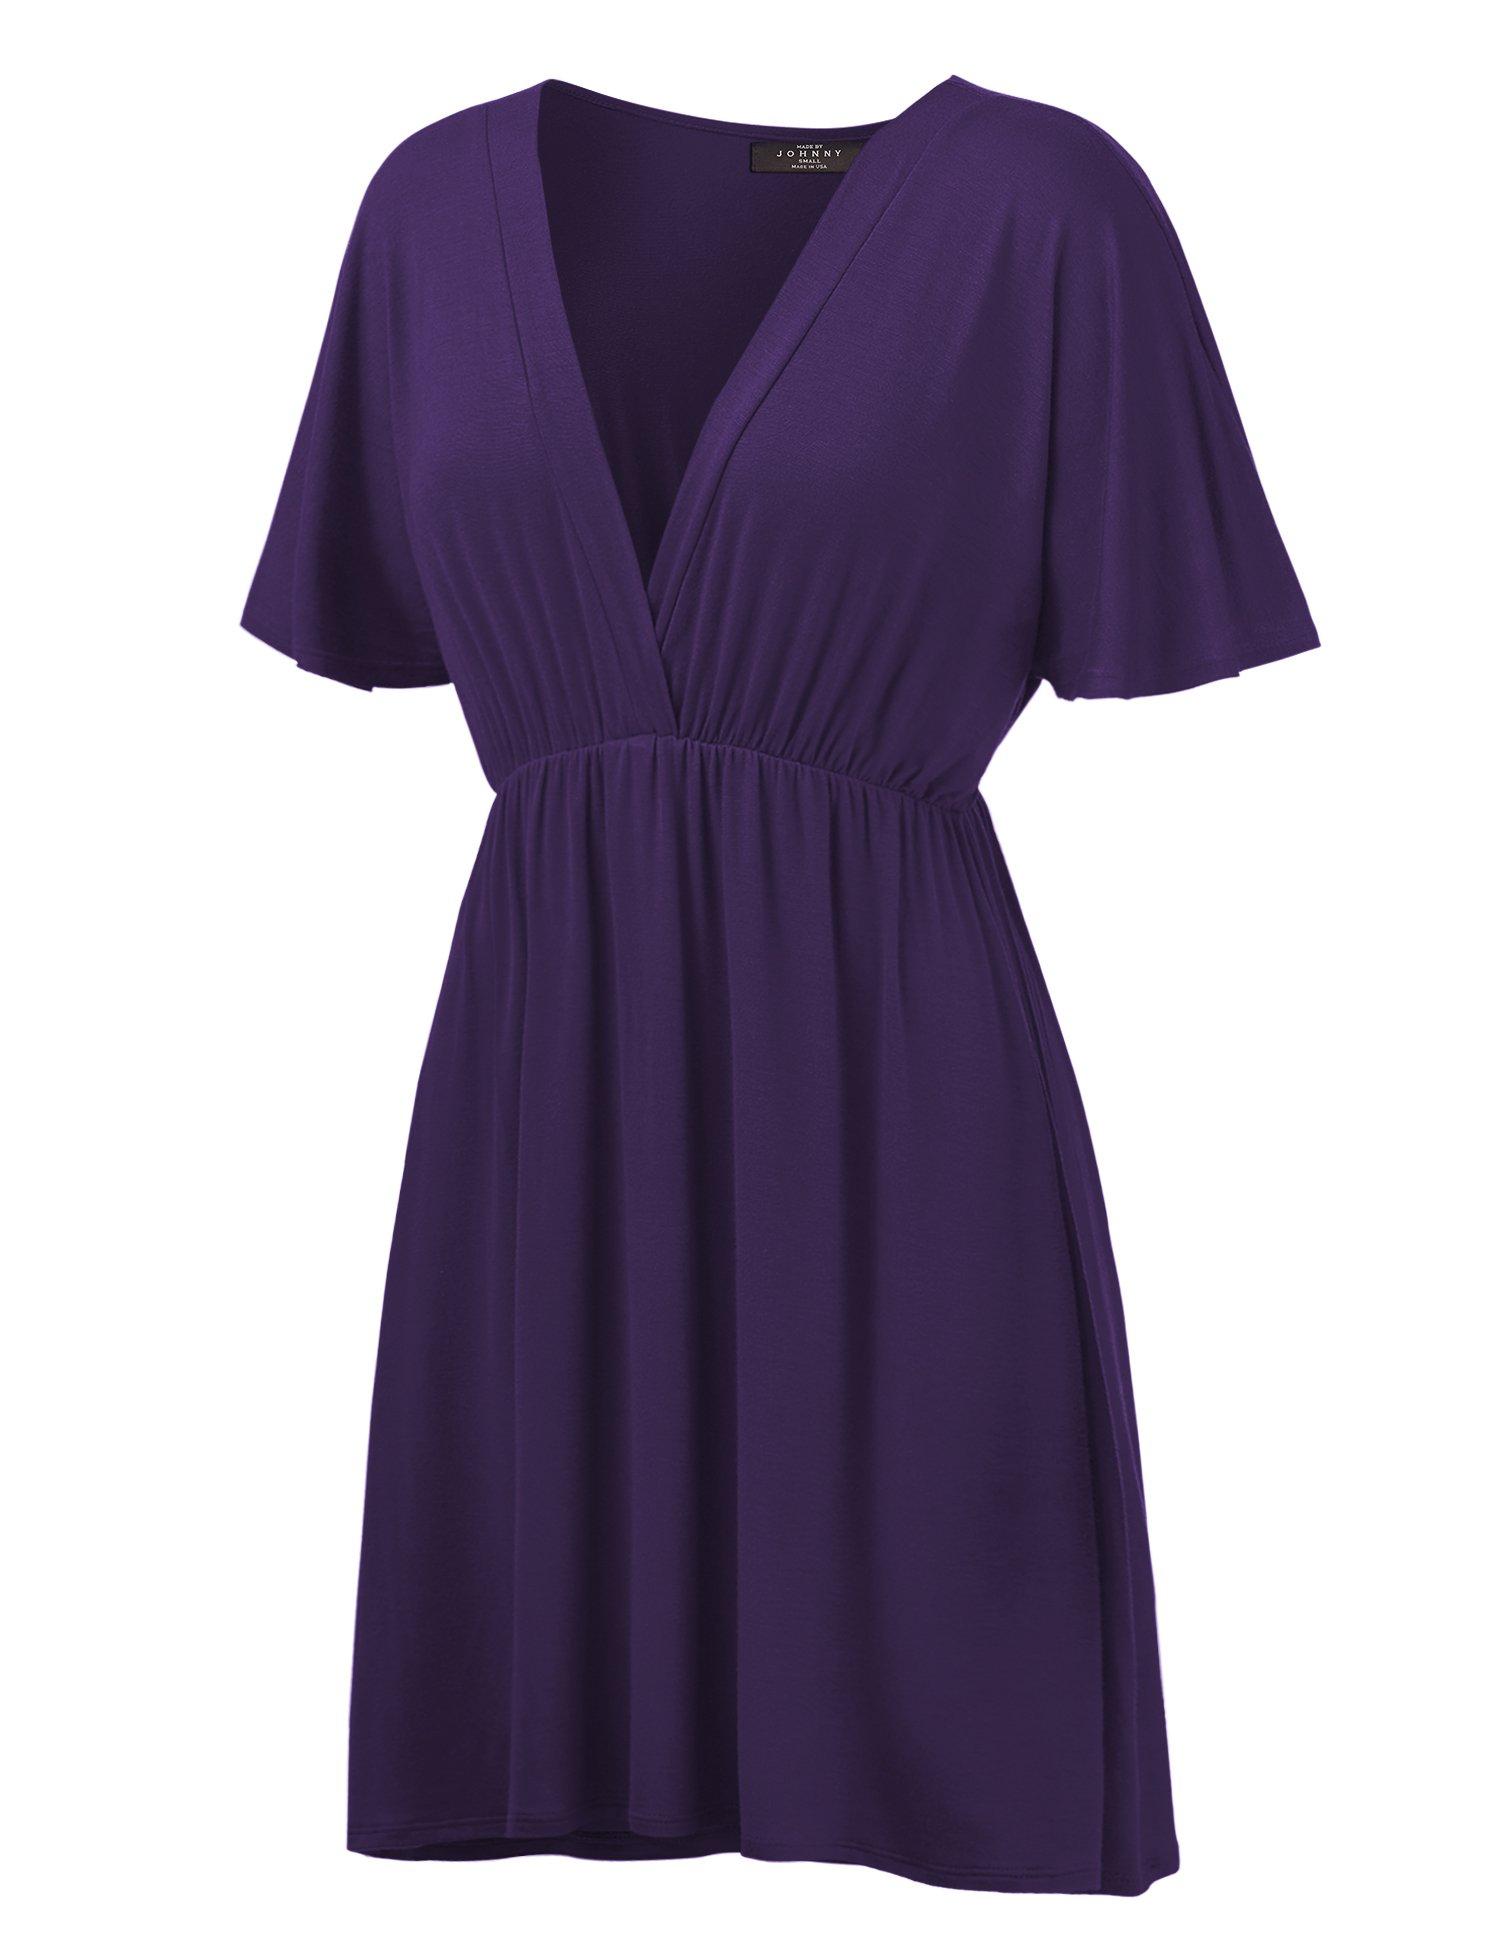 WDR1338 Womens Short Sleeve Kimono Style Dress Top L DARK_PURPLE